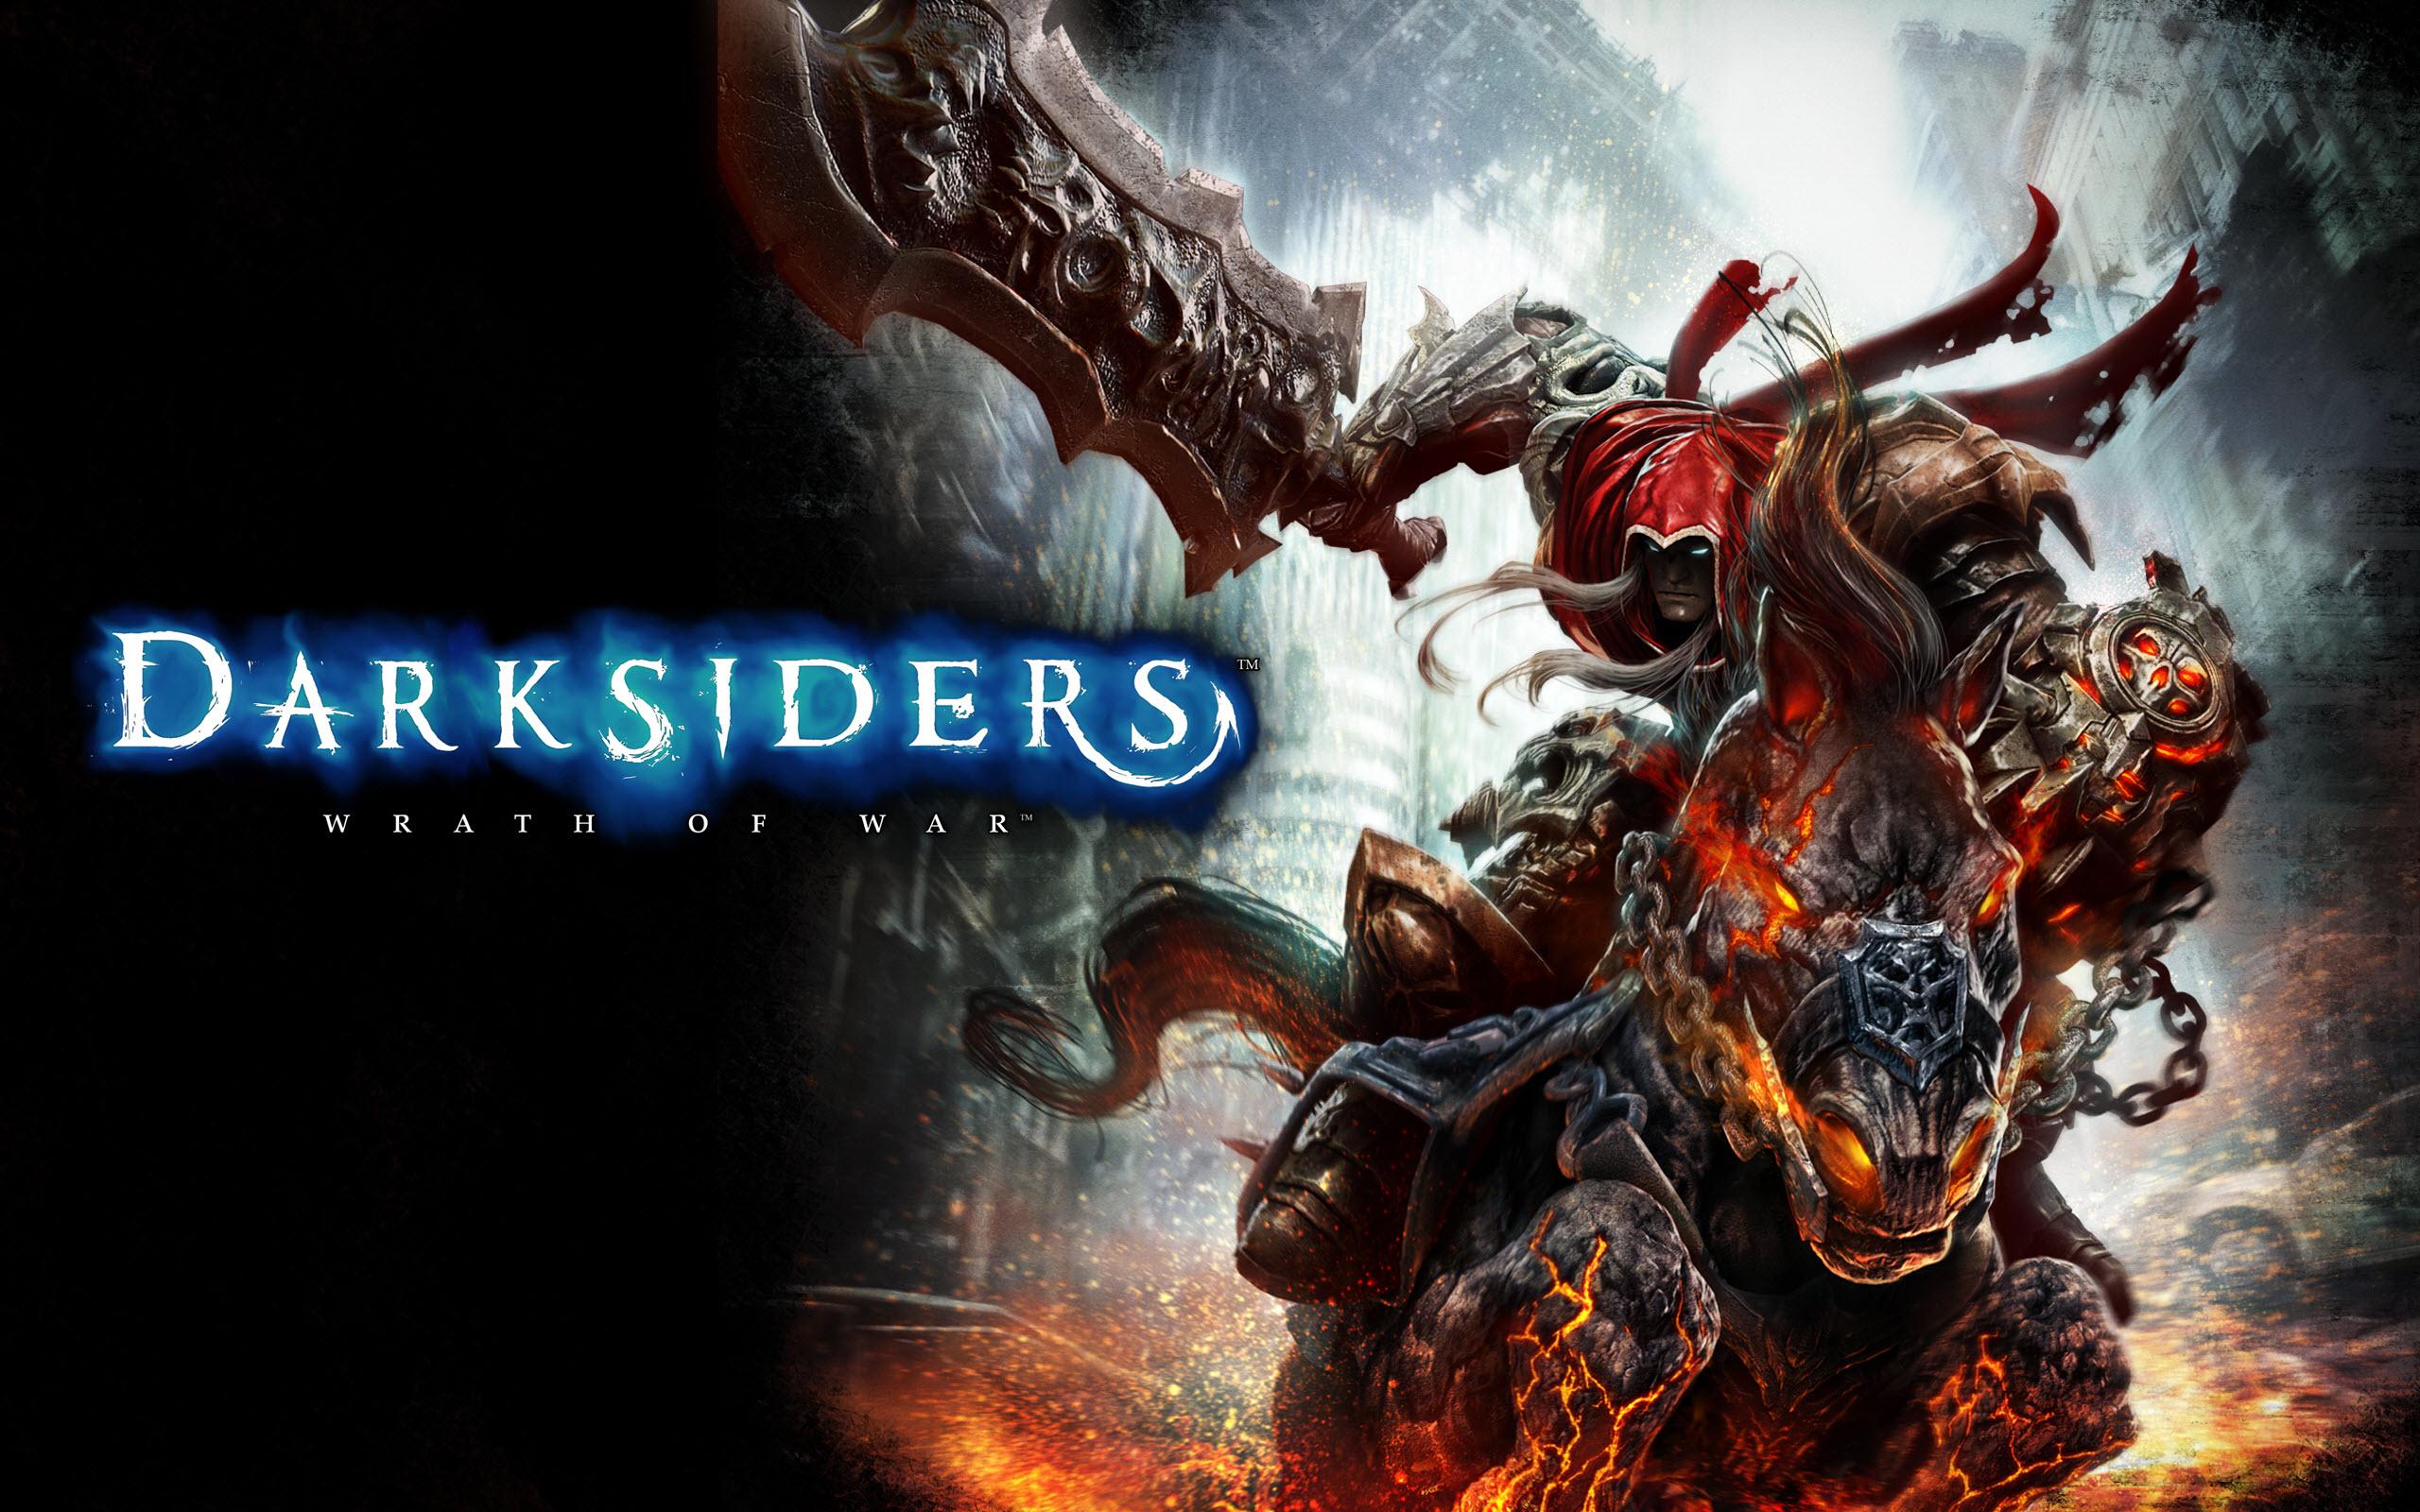 Darksiders Wrath of War Wallpapers HD Wallpapers 2560x1600